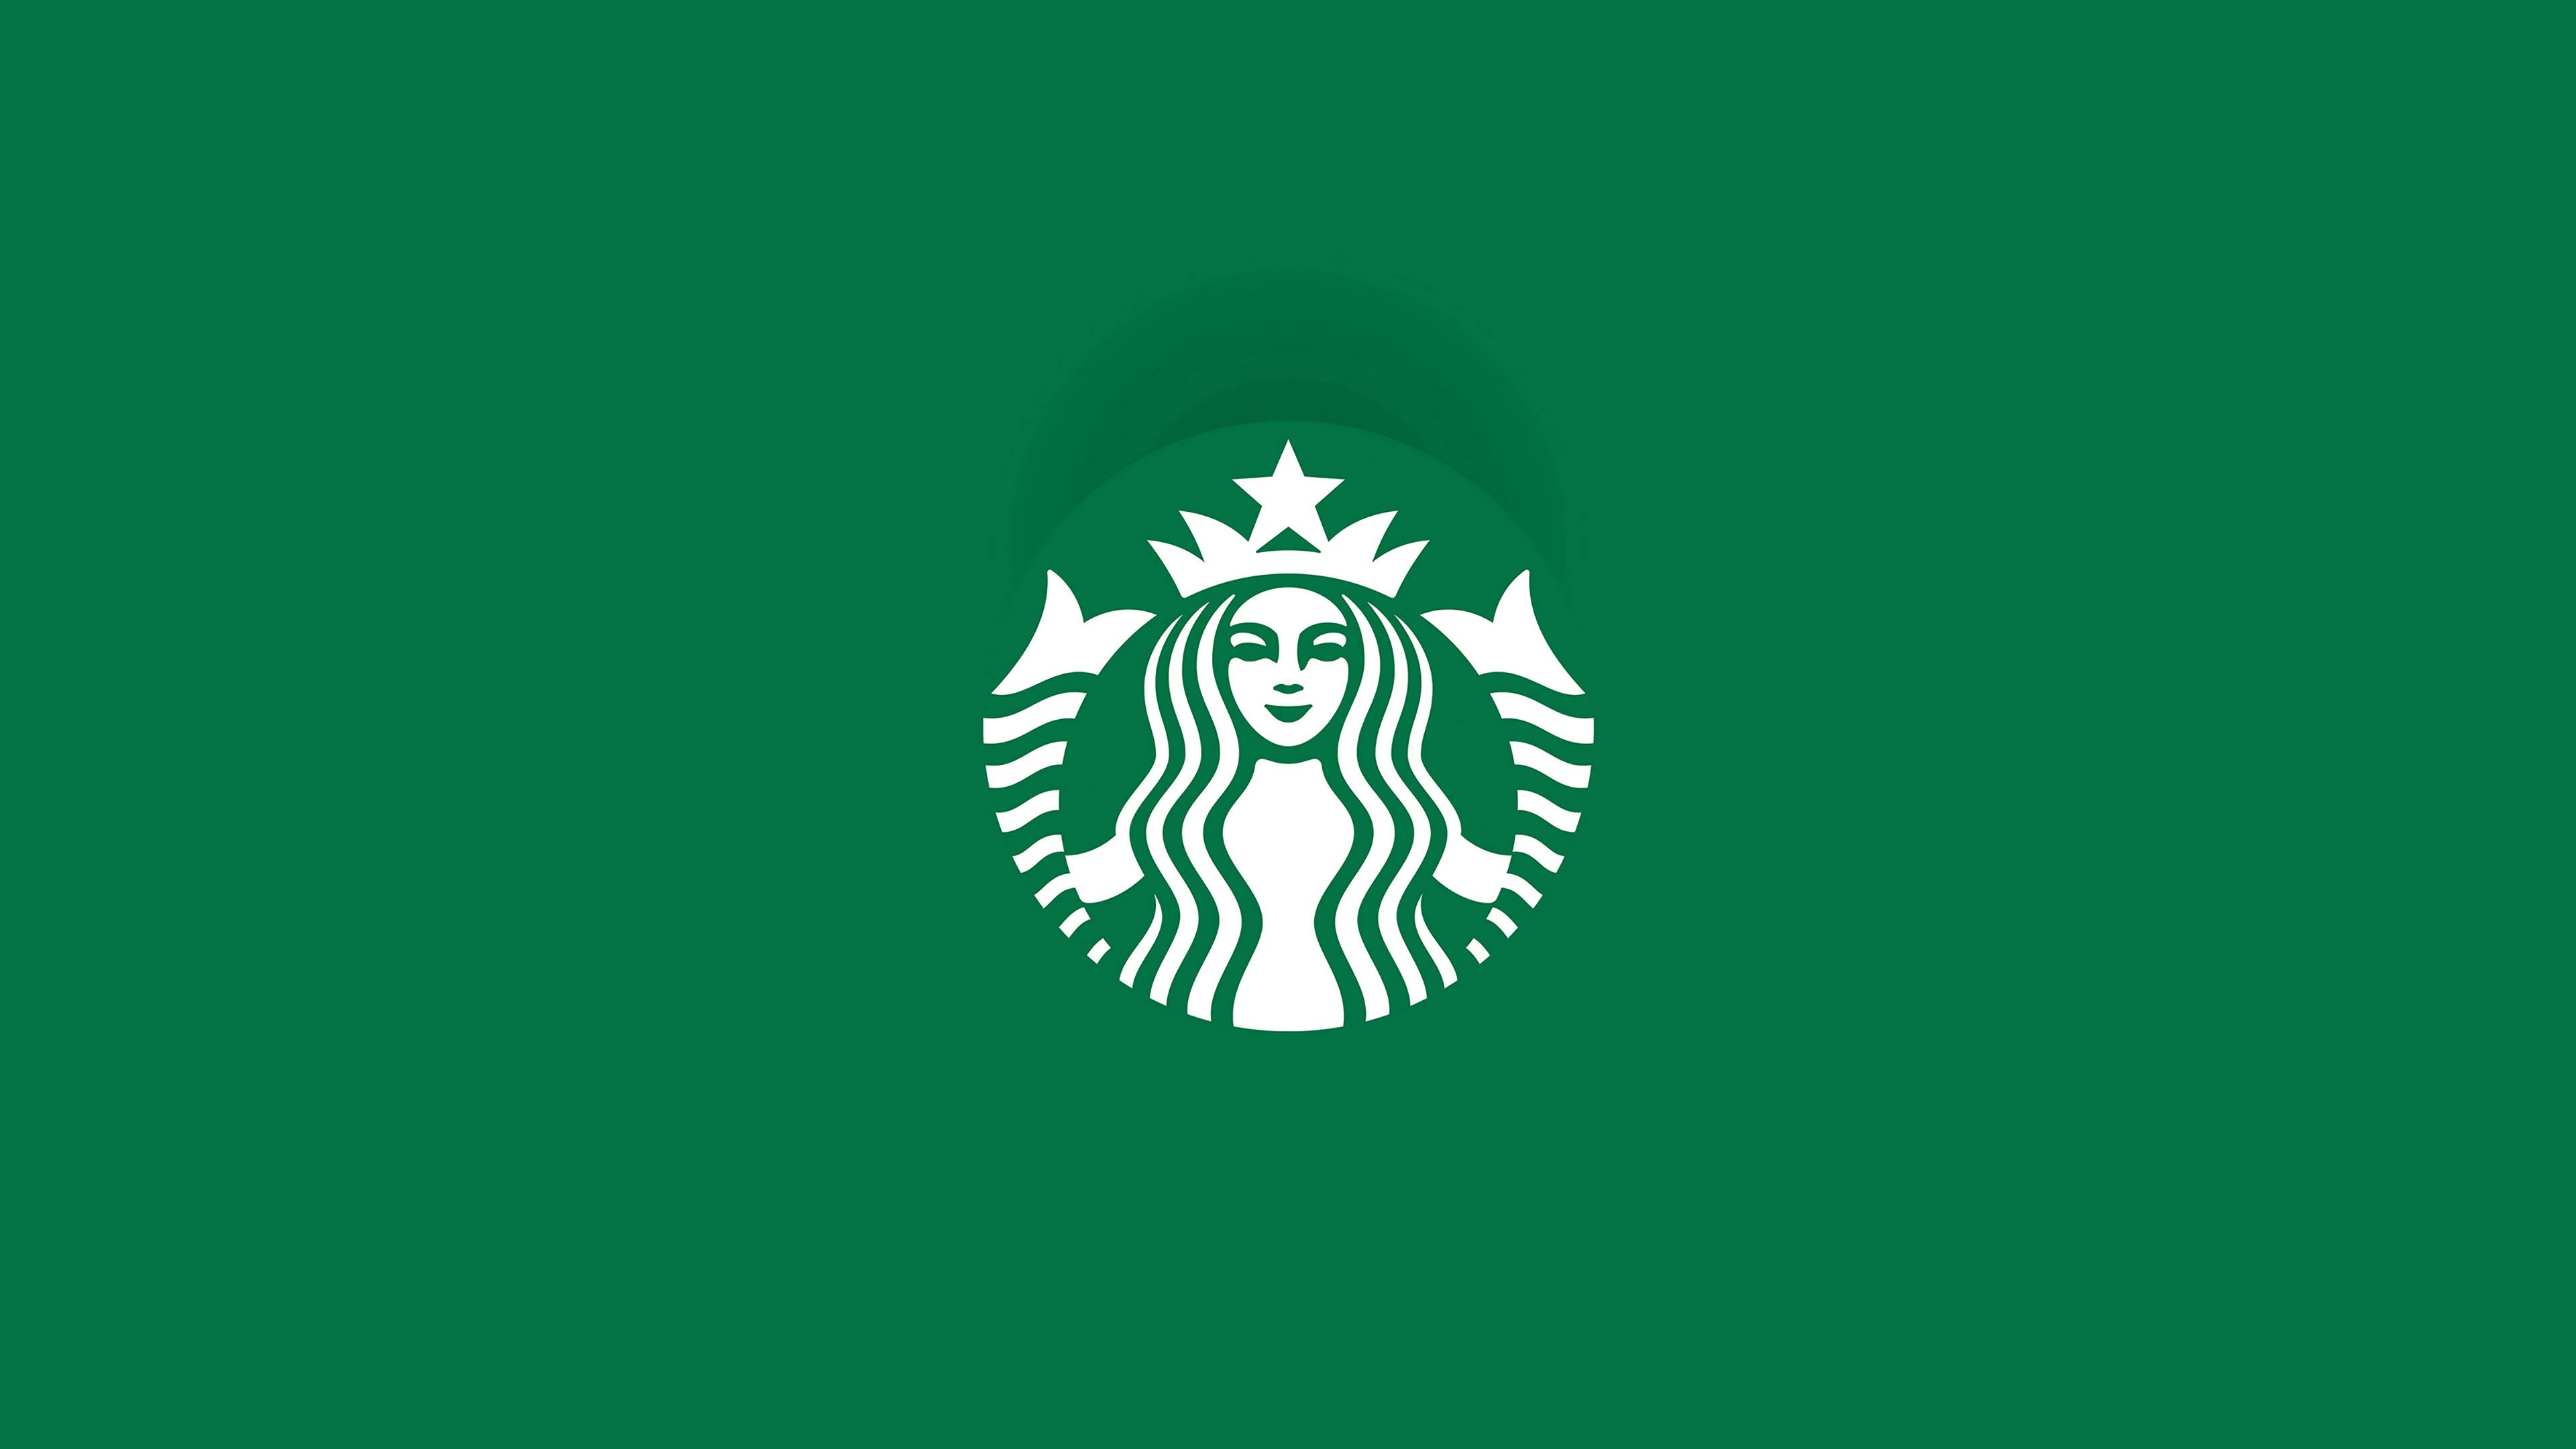 High Resolution Green Starbucks Logo Wallpaper Ultra HD